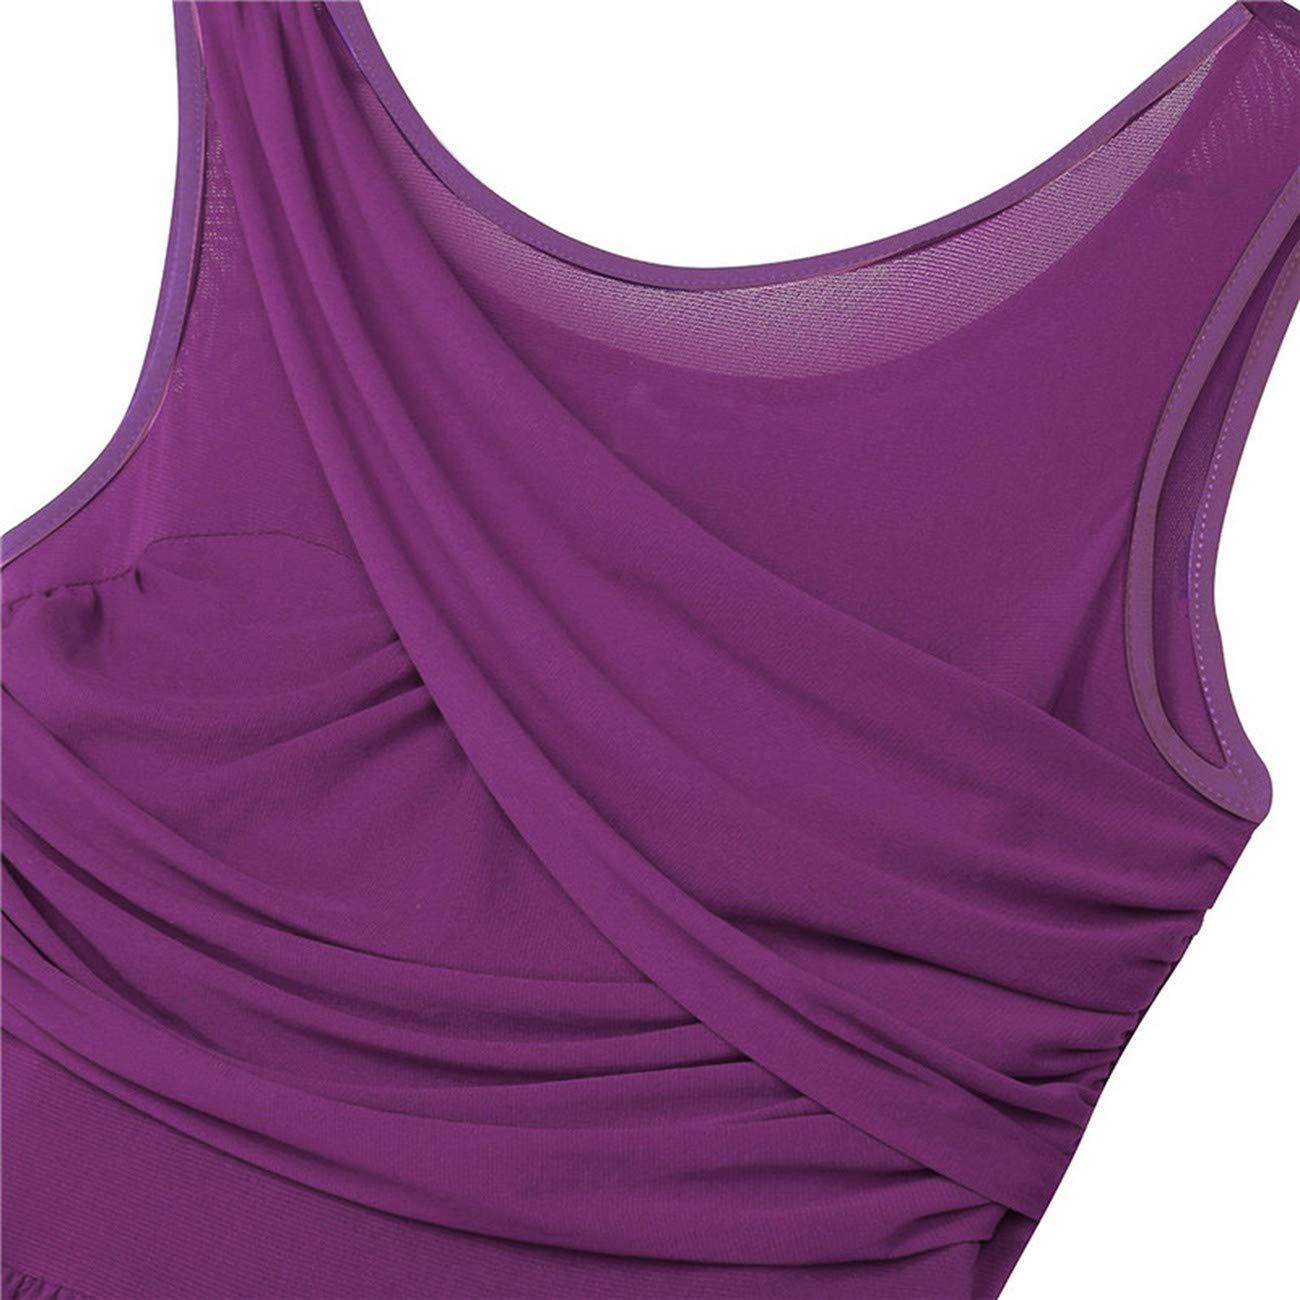 feyioog Womens Sleeveless Cut Out Asymmetric Chiffon Ballet Dance Leotard Dress Practice Costumes Dancewear